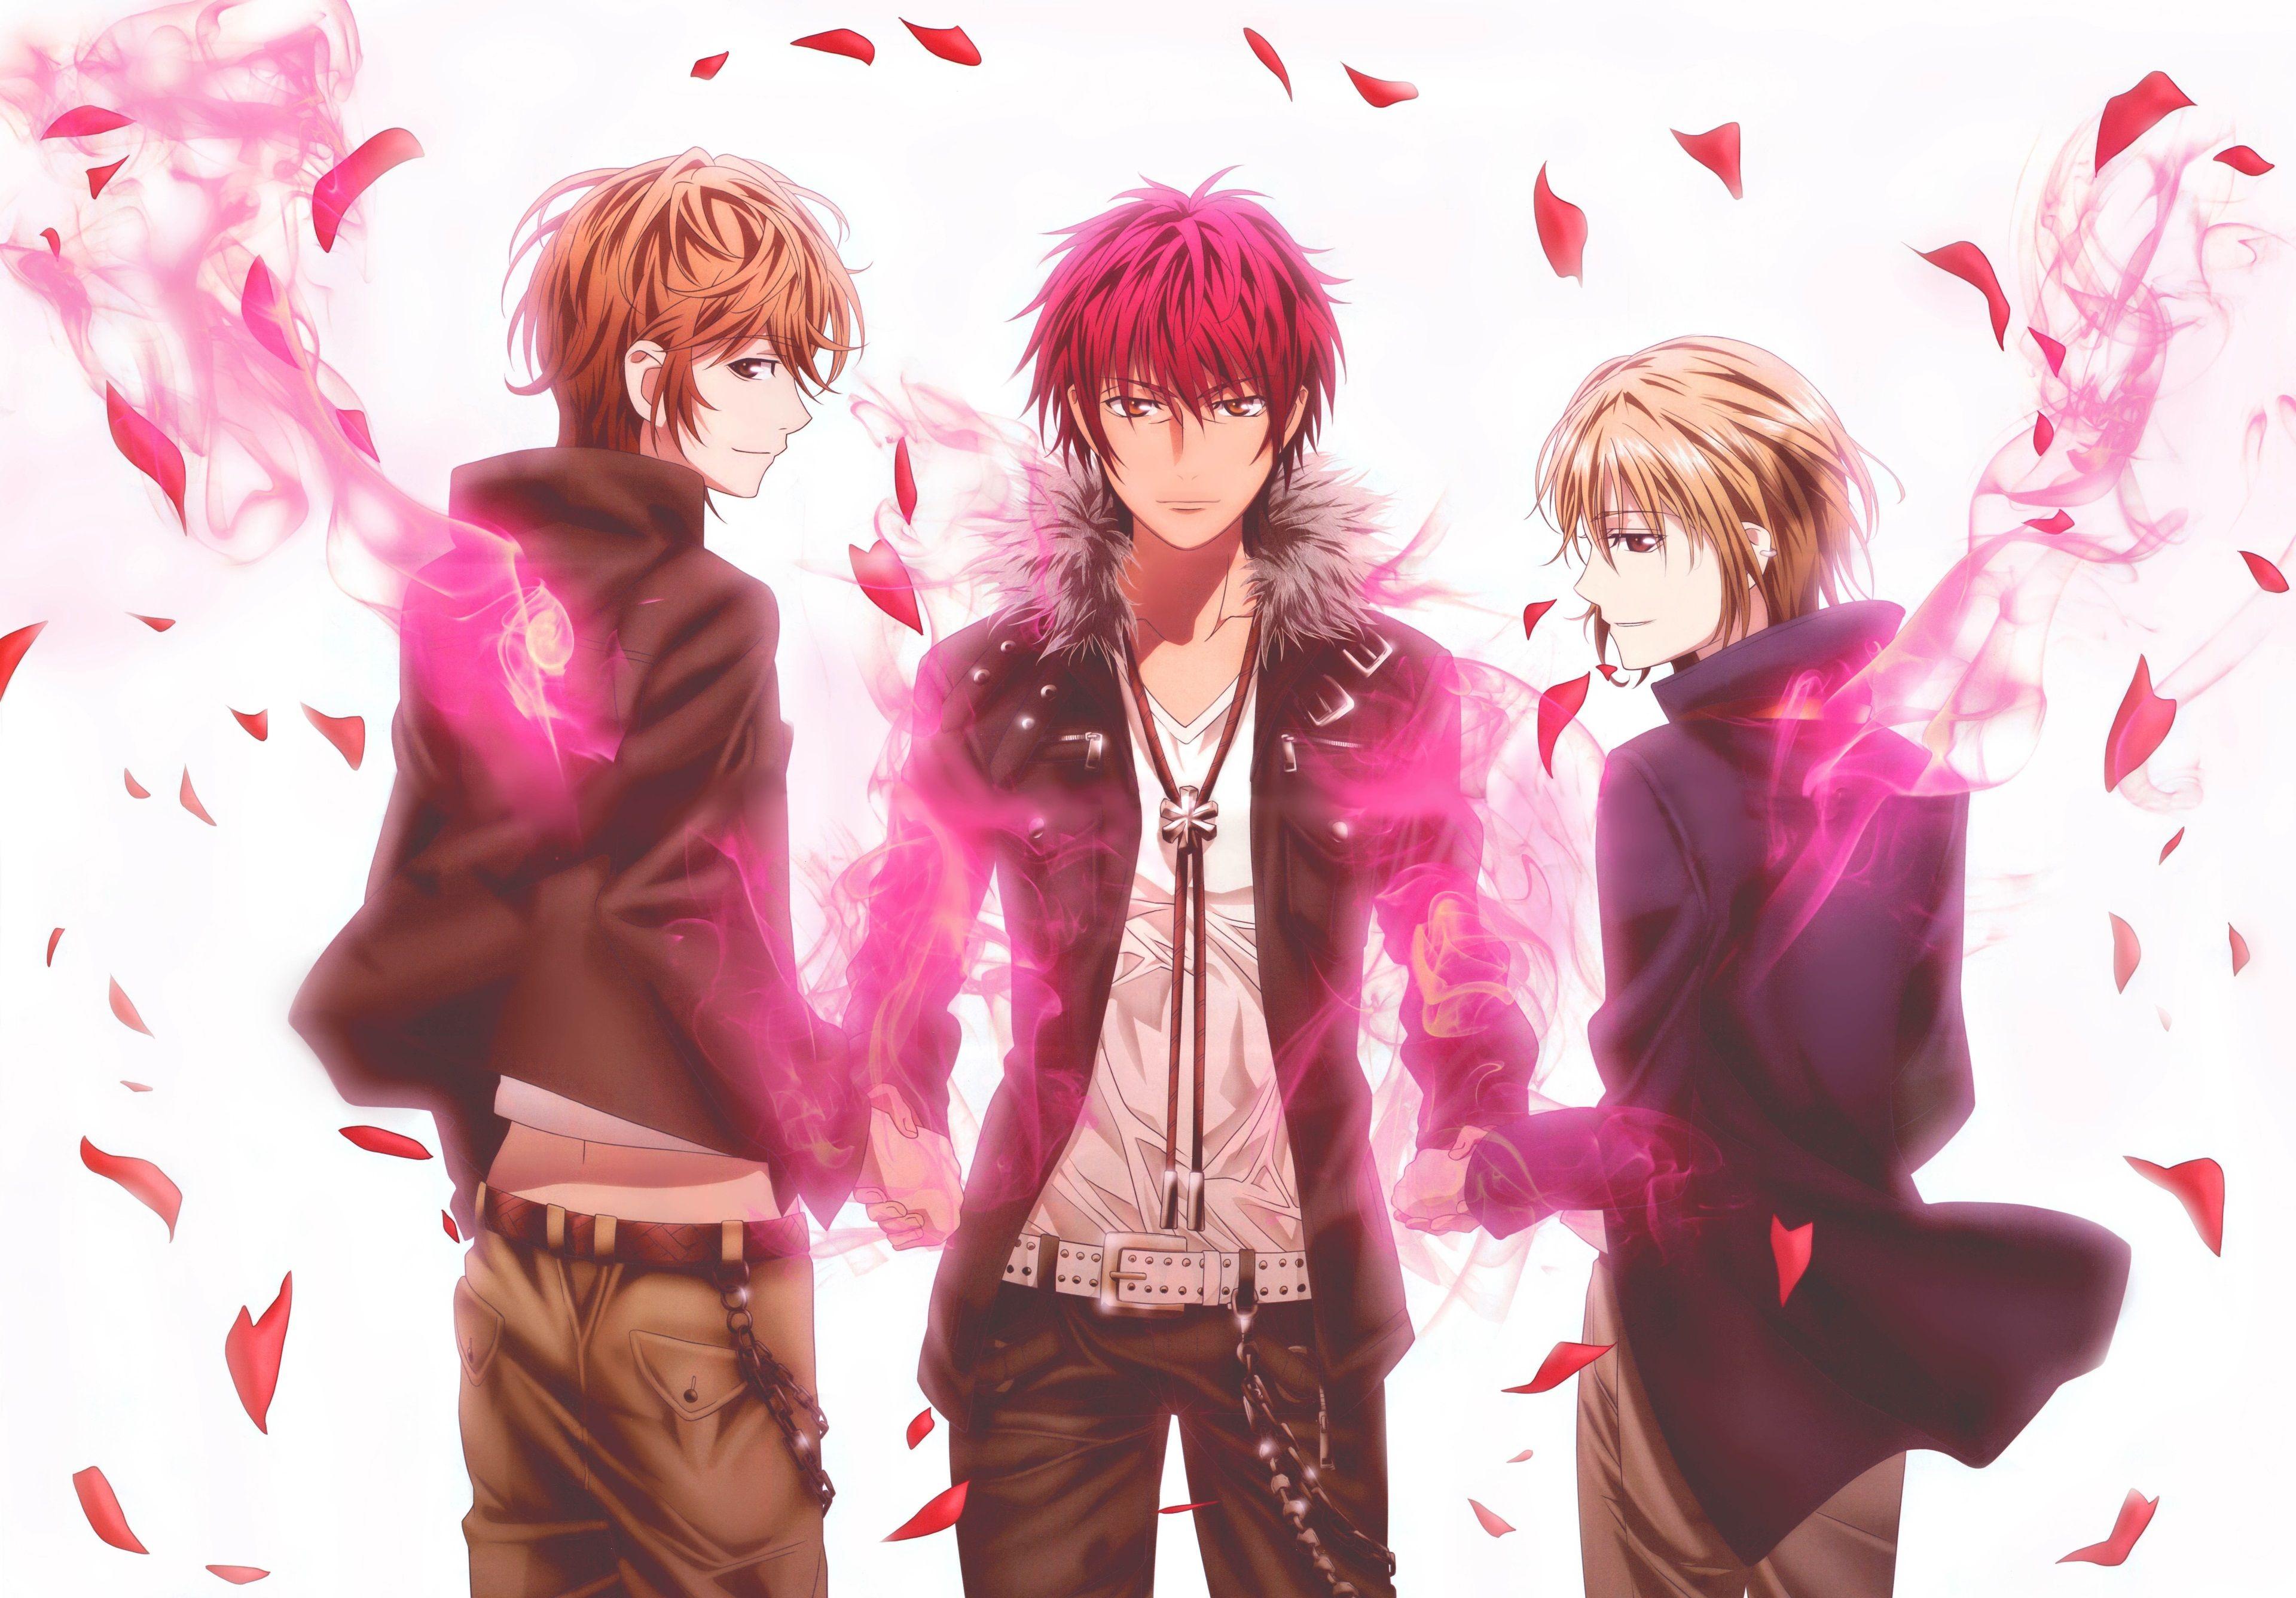 3840x2672 Mikoto Suoh 4k Hd Best Wallpaper For Desktop K Project Anime K Project Anime